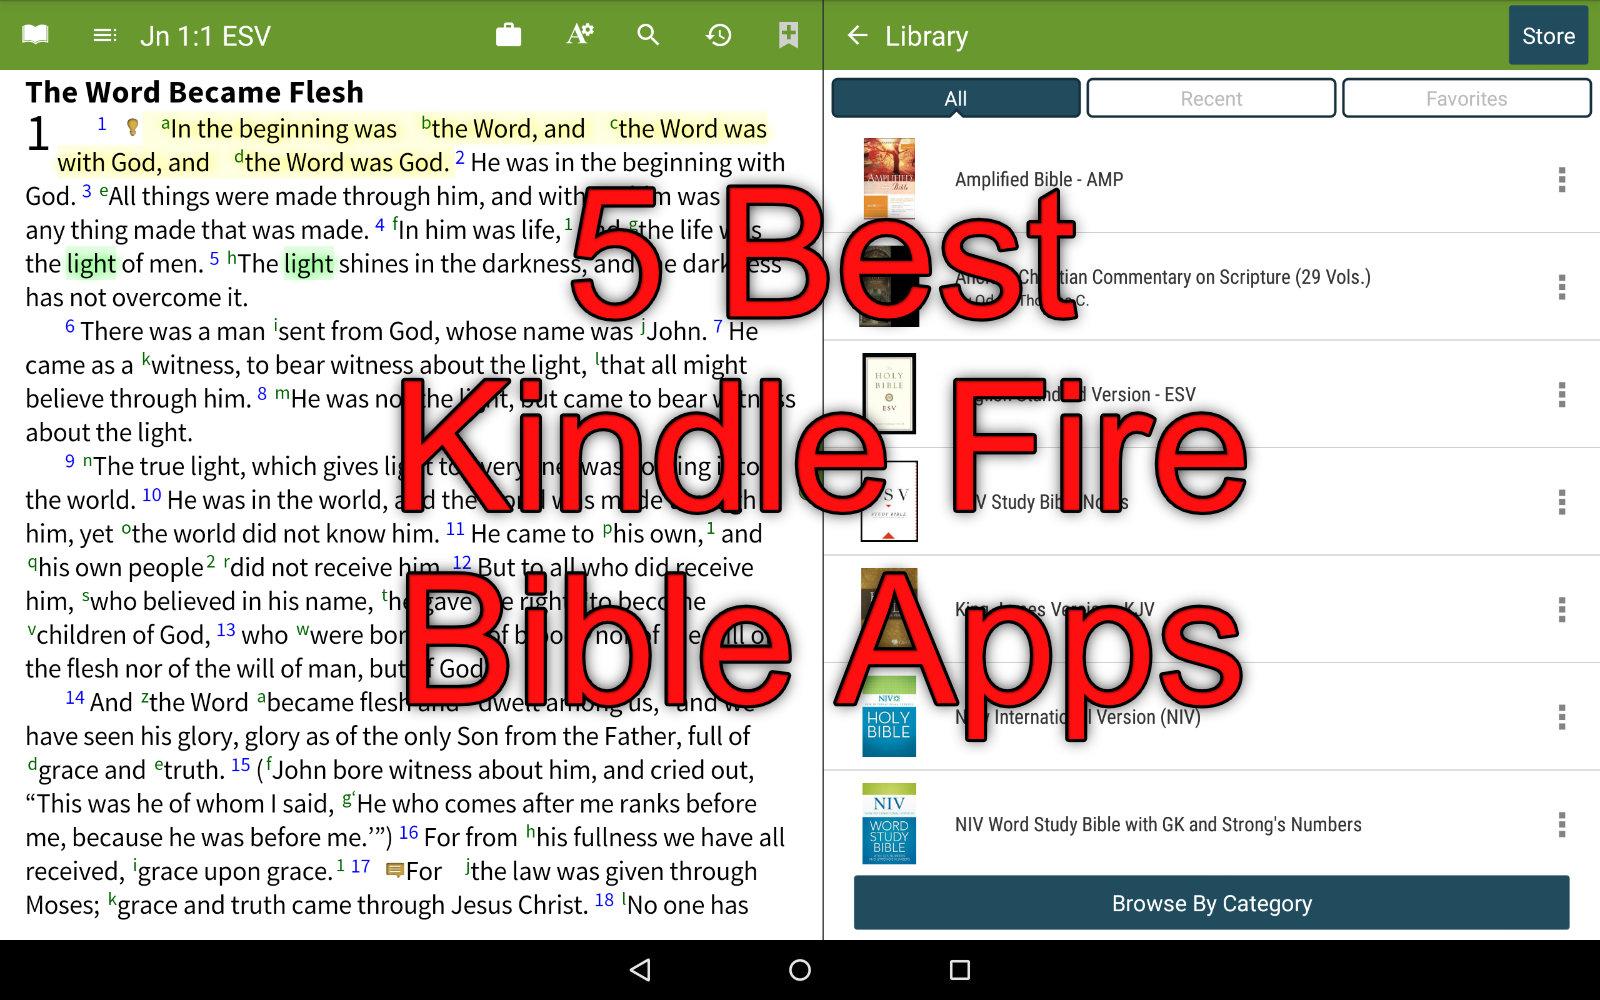 5 best kindle fire bible apps